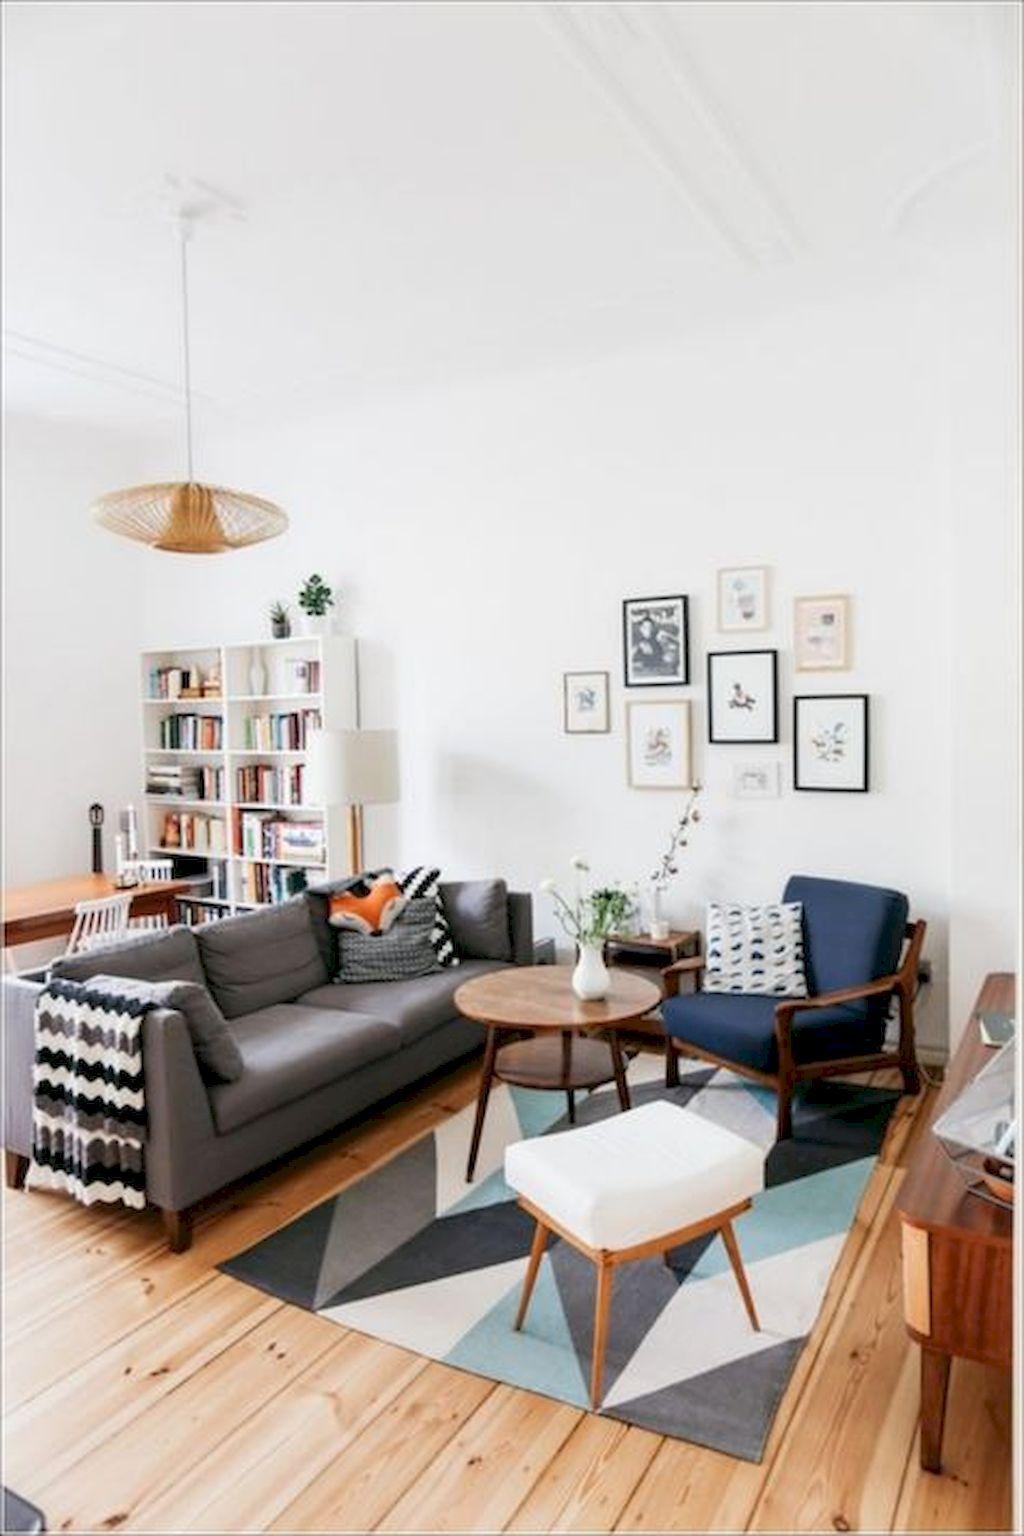 75 Cozy Apartment Living Room Decorating Ideas | Pinterest ...